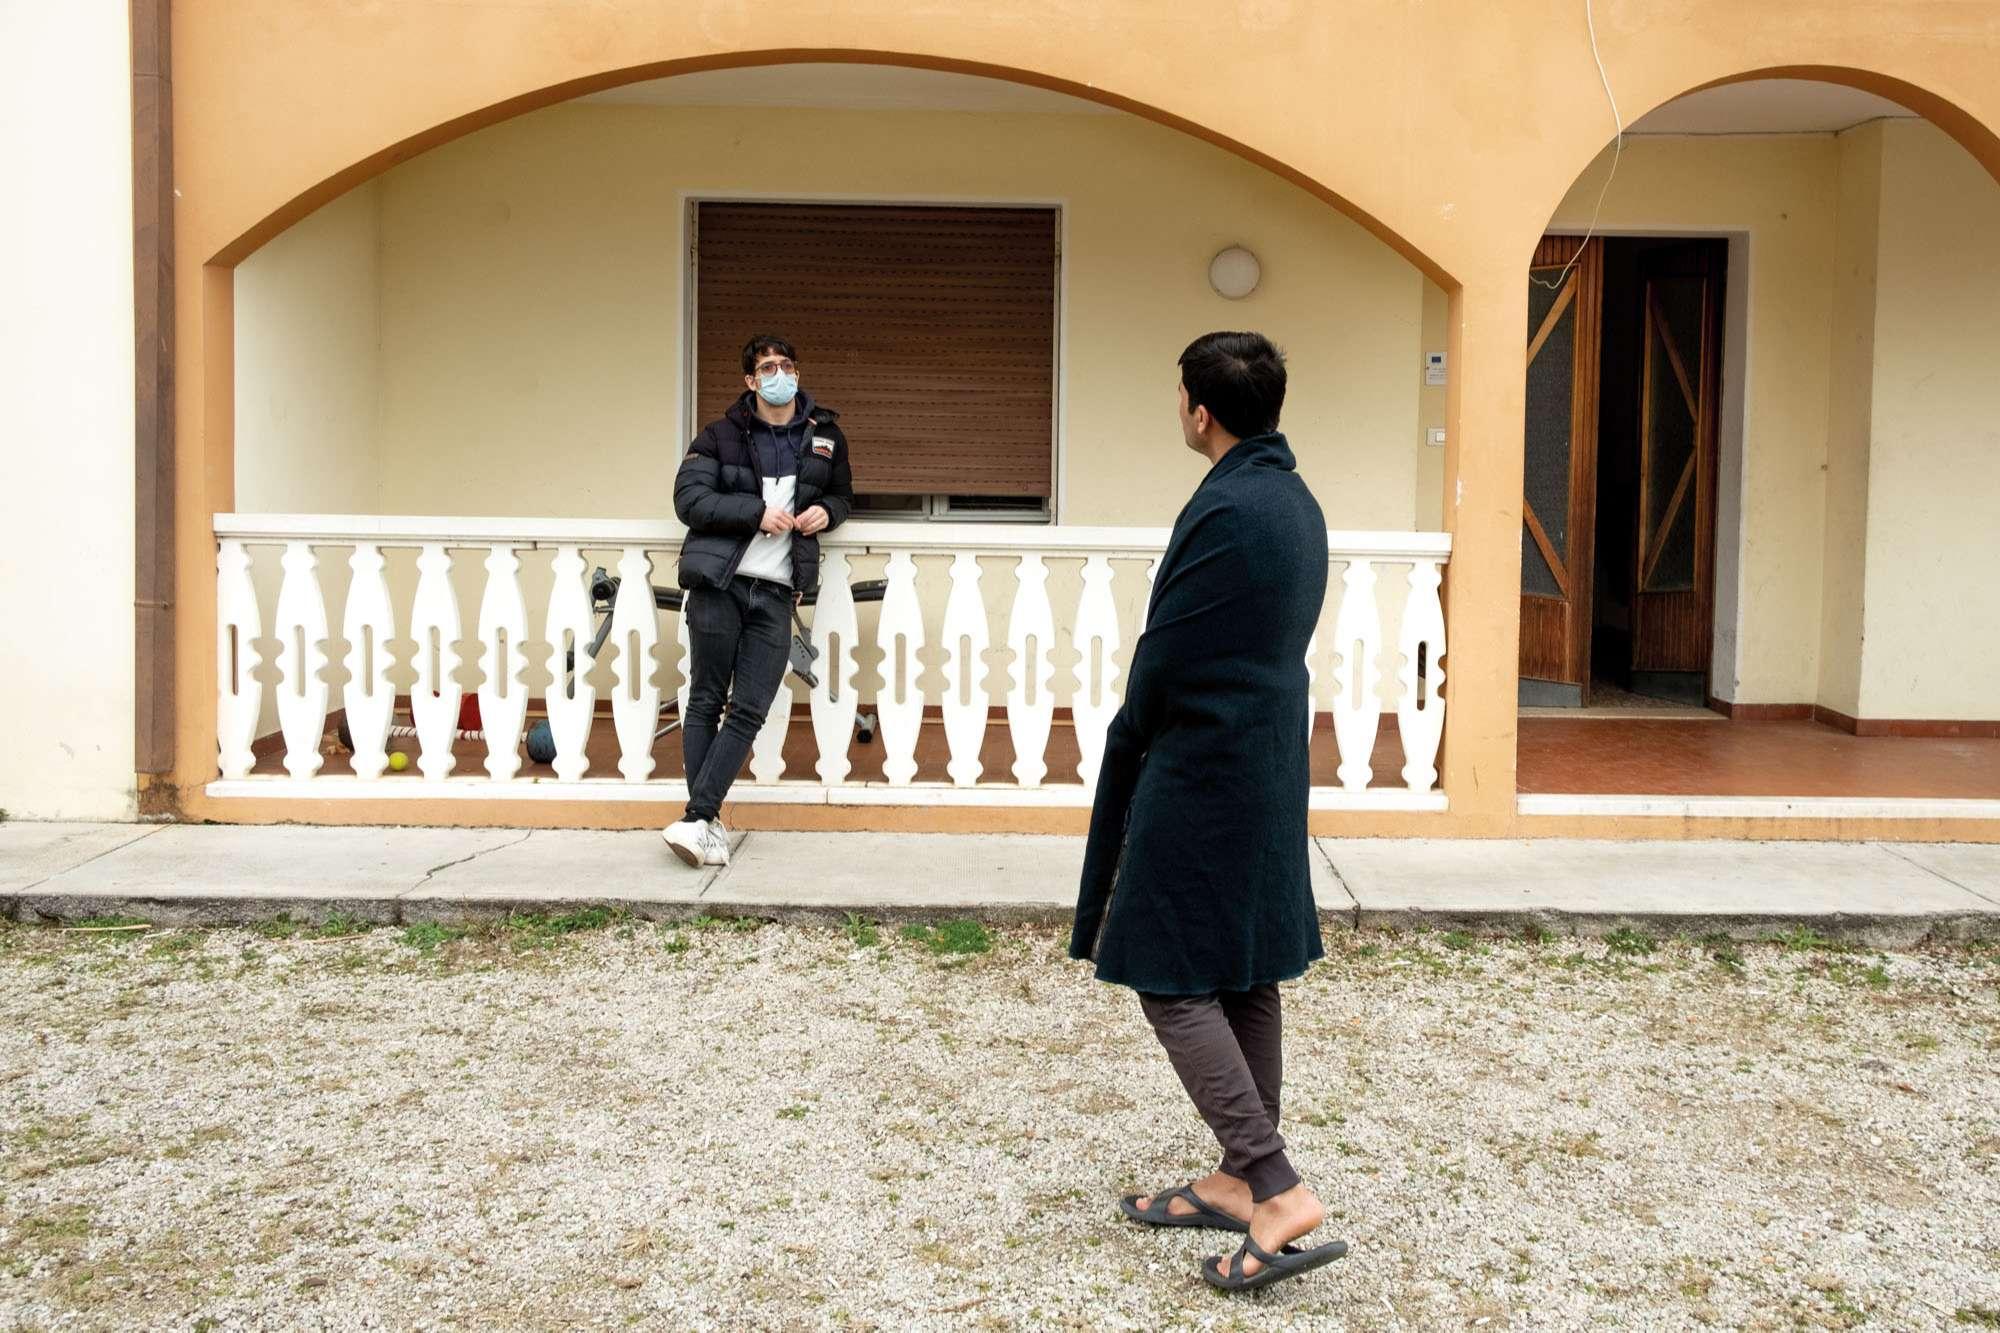 Dialogo tra richiedente asilo e operatore